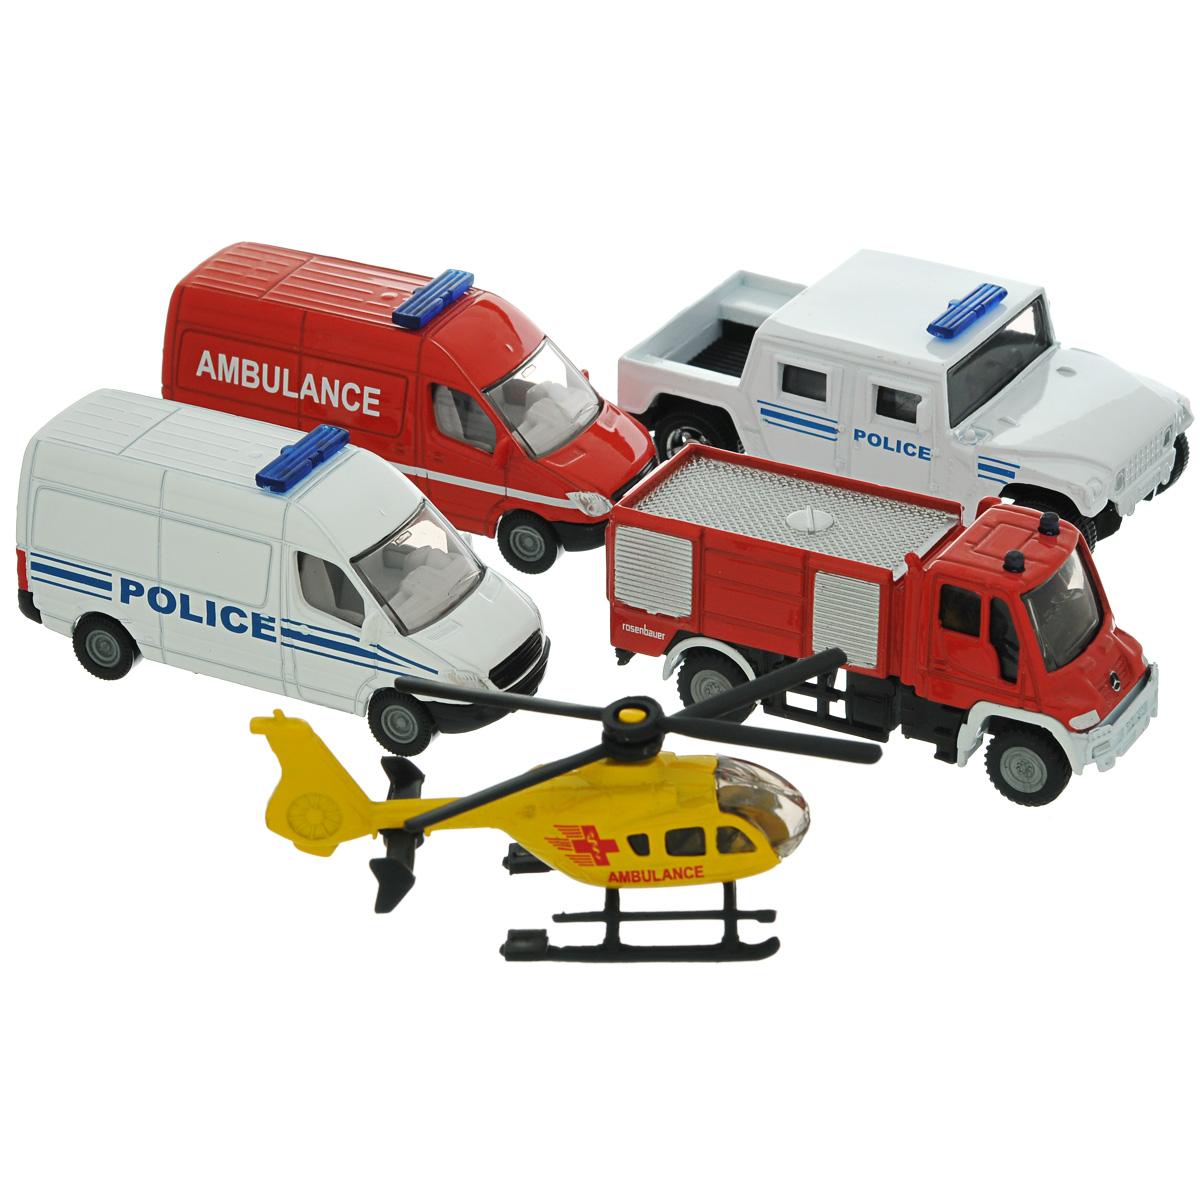 Siku Игровой набор Служба спасения игрушка siku ауди r8 8 0 3 7 2 4см 1430